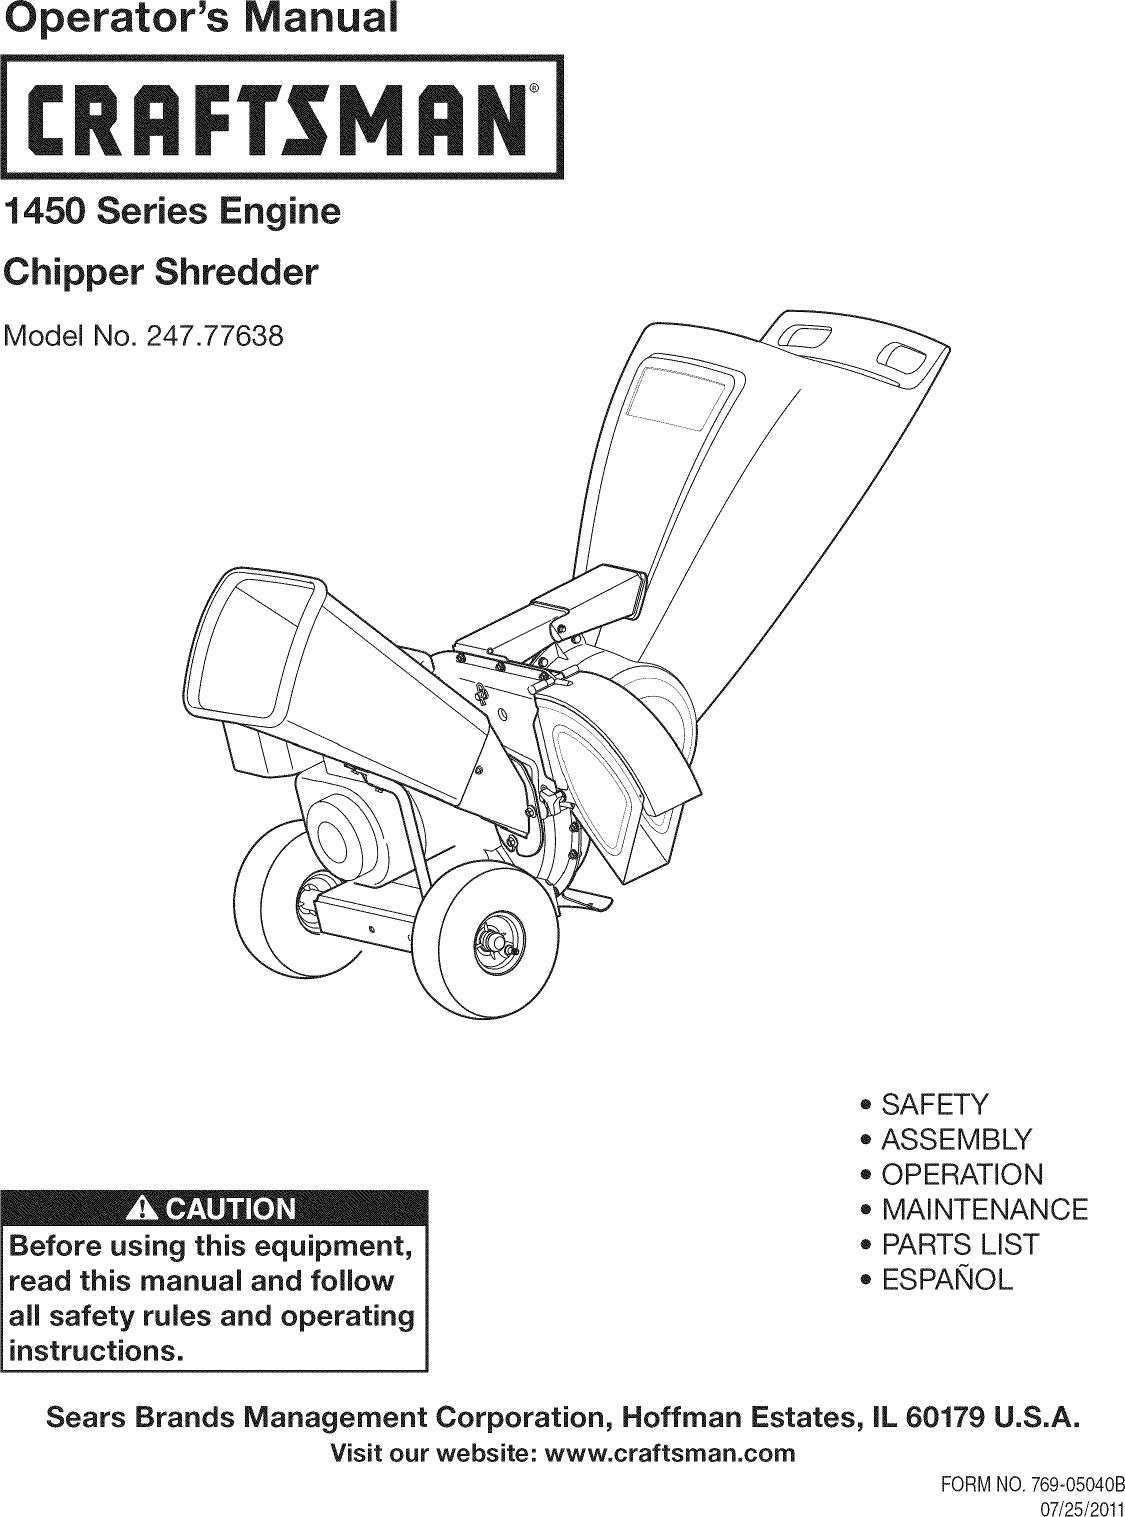 Sears Lawn Tractor Wiring Diagram 247 795940 Electrical Suburban 12 Craftsman Chipper Manual Pdf Data Diagrams U2022